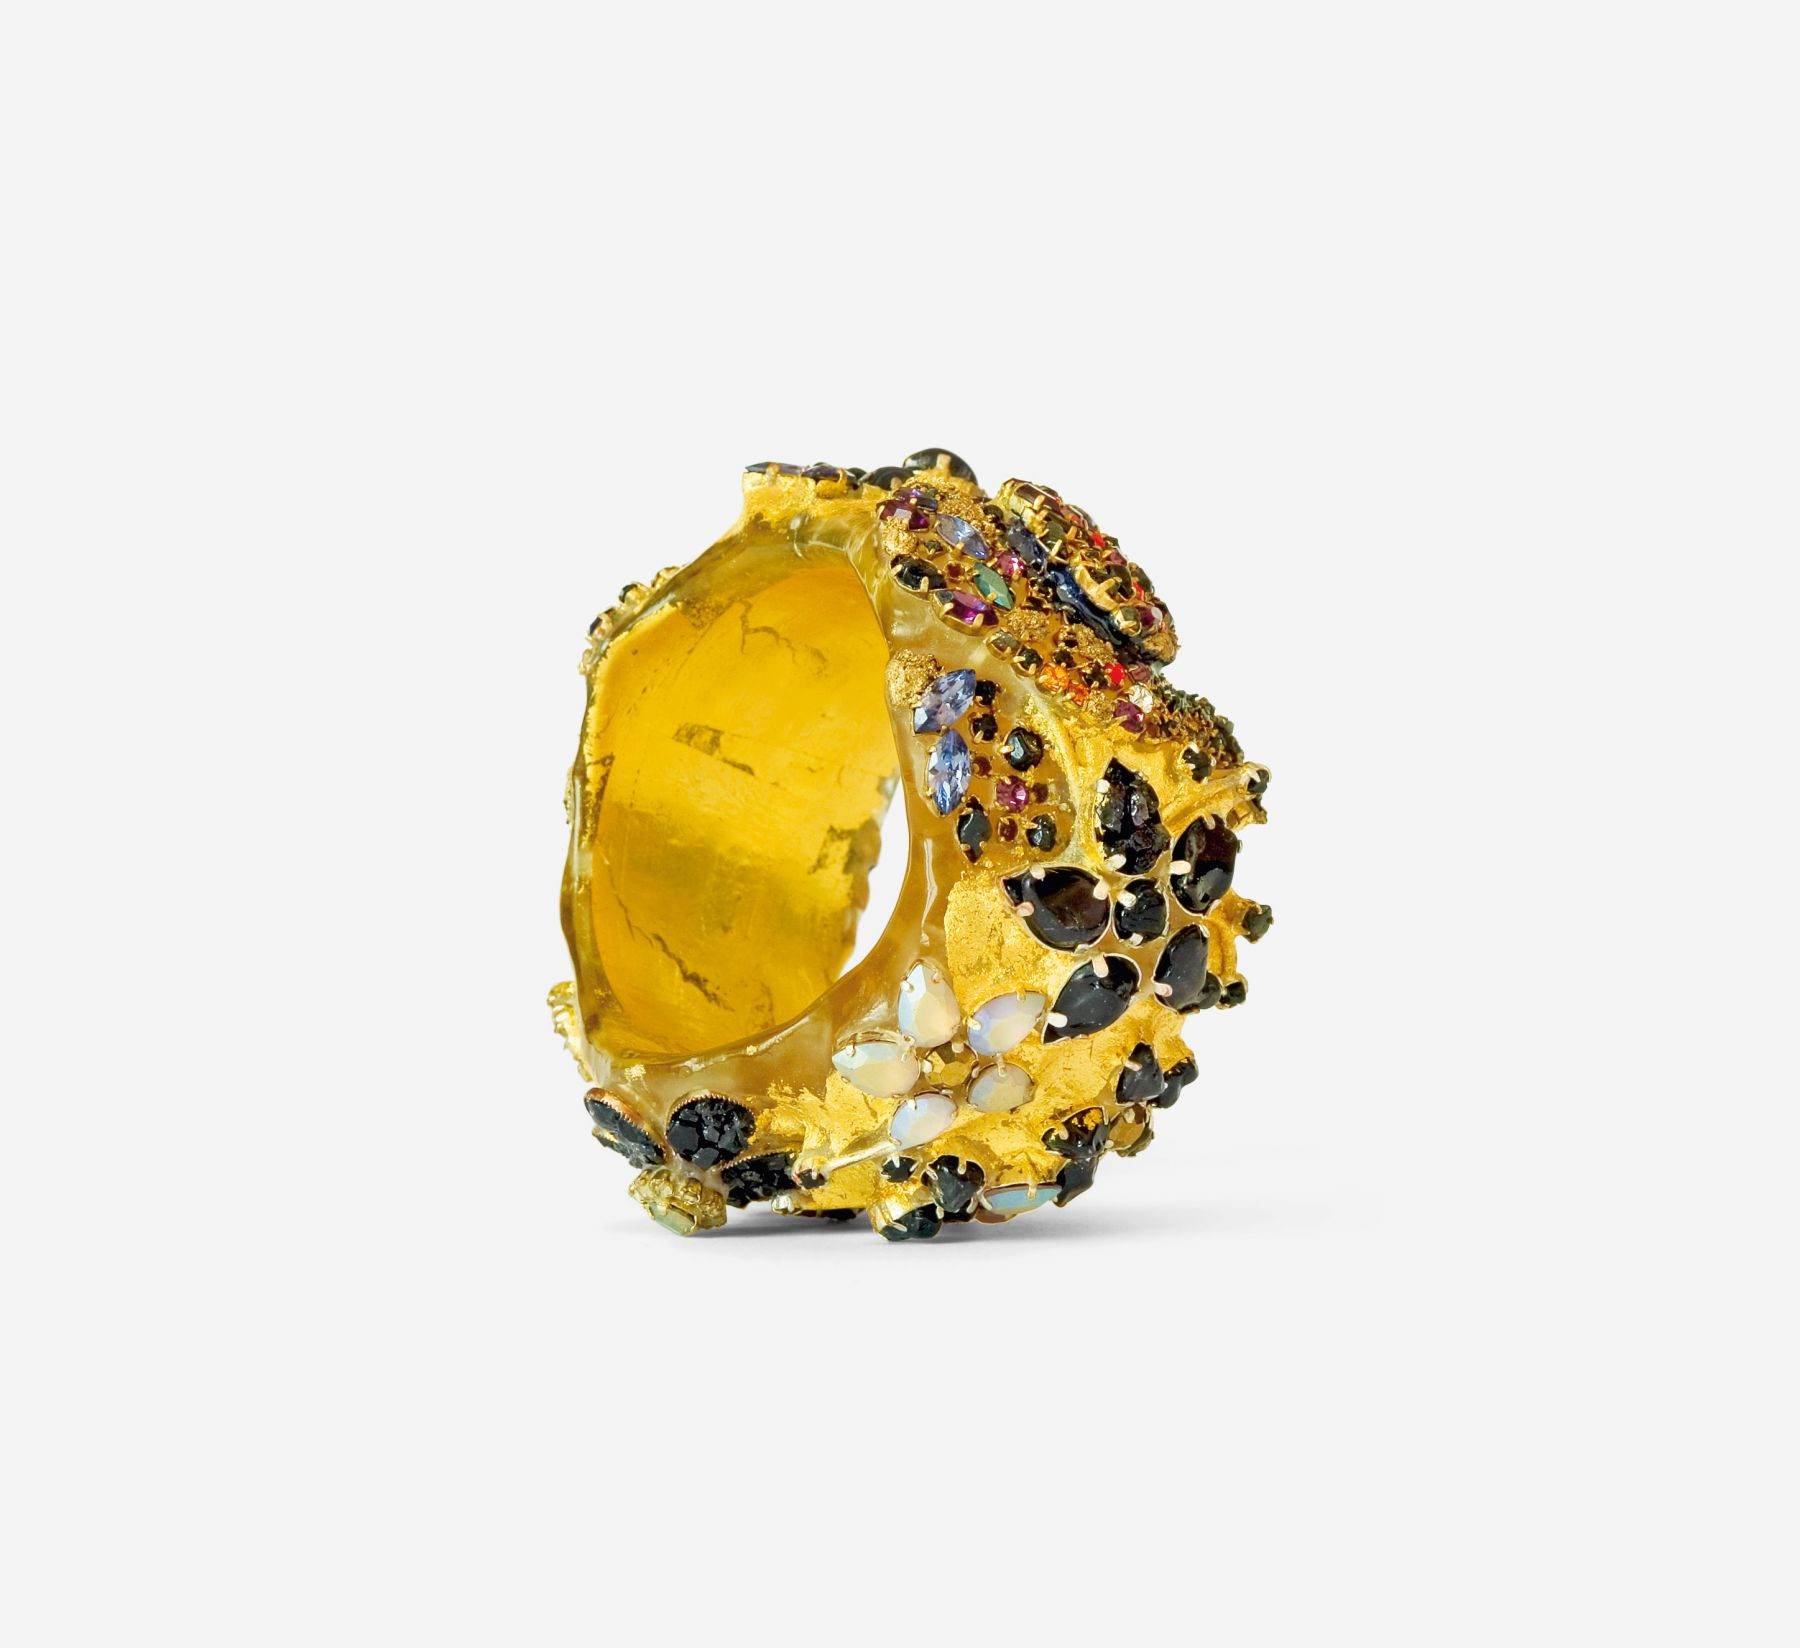 Petra Zimmermann bracelet, Austrian contemporary jewelry, encrusted, acrylic